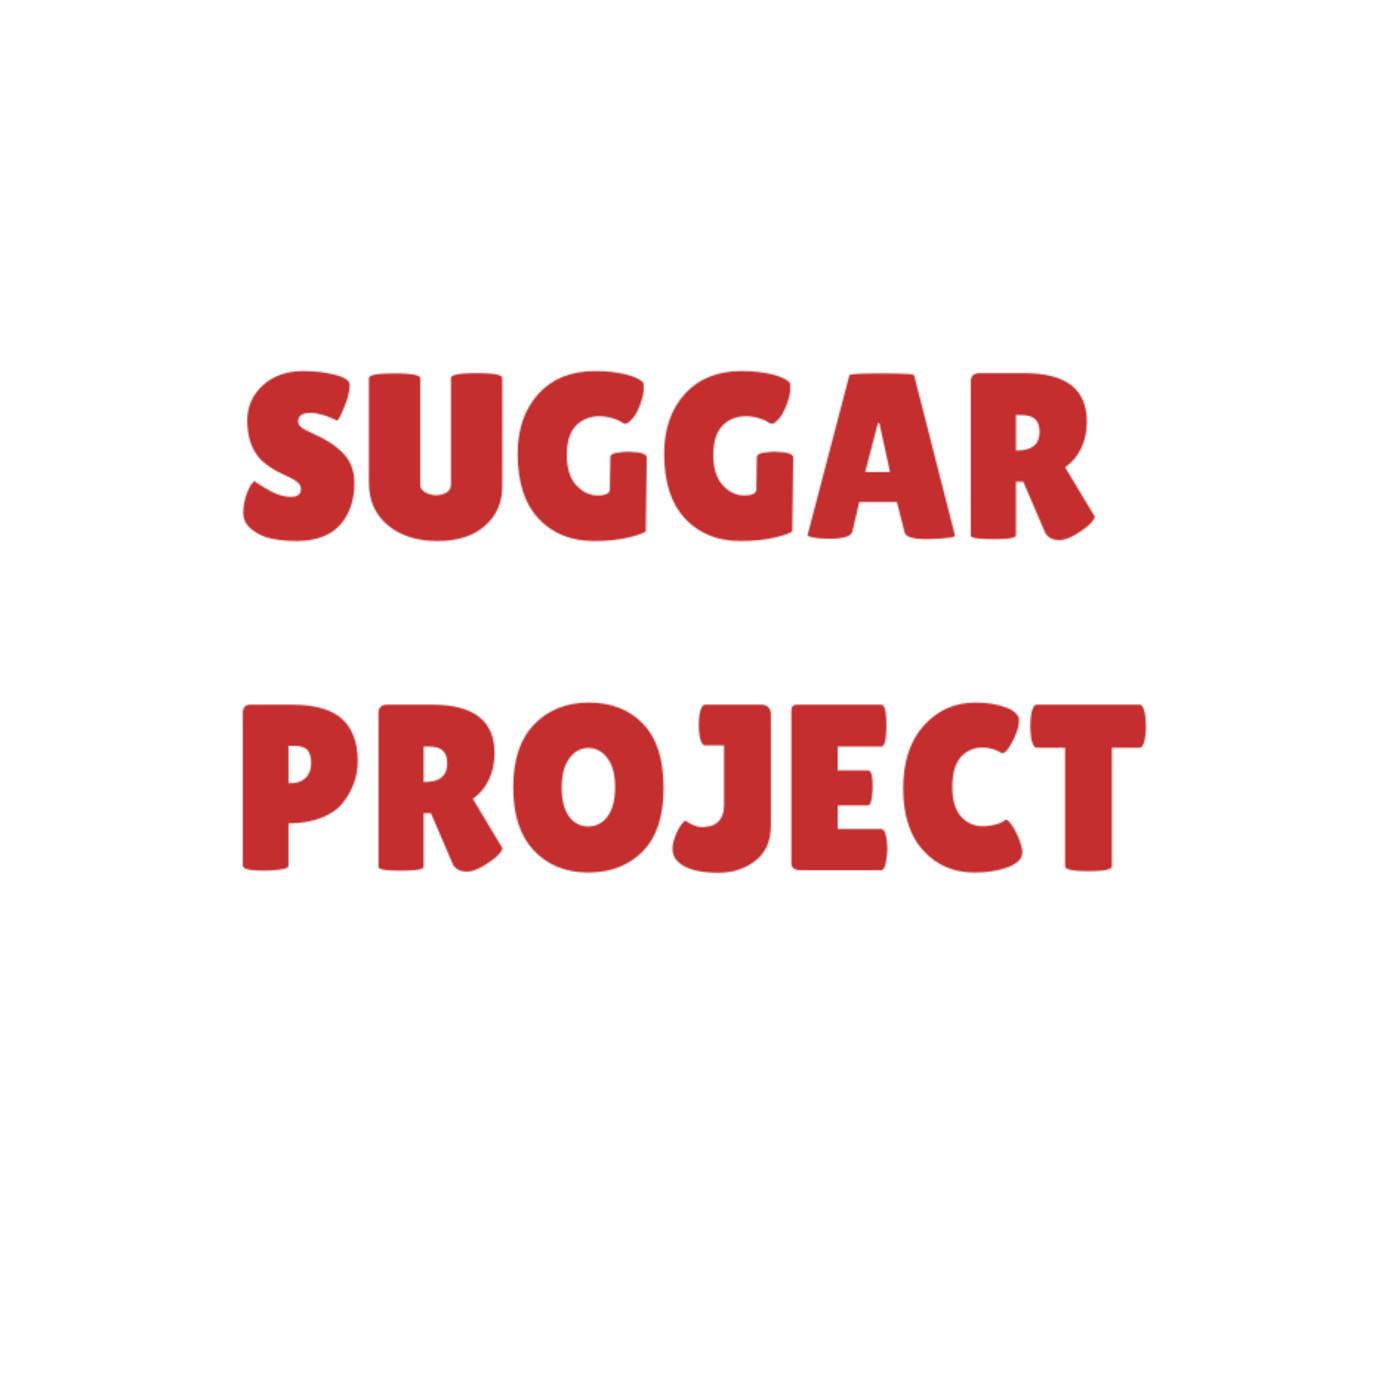 Suggar Project